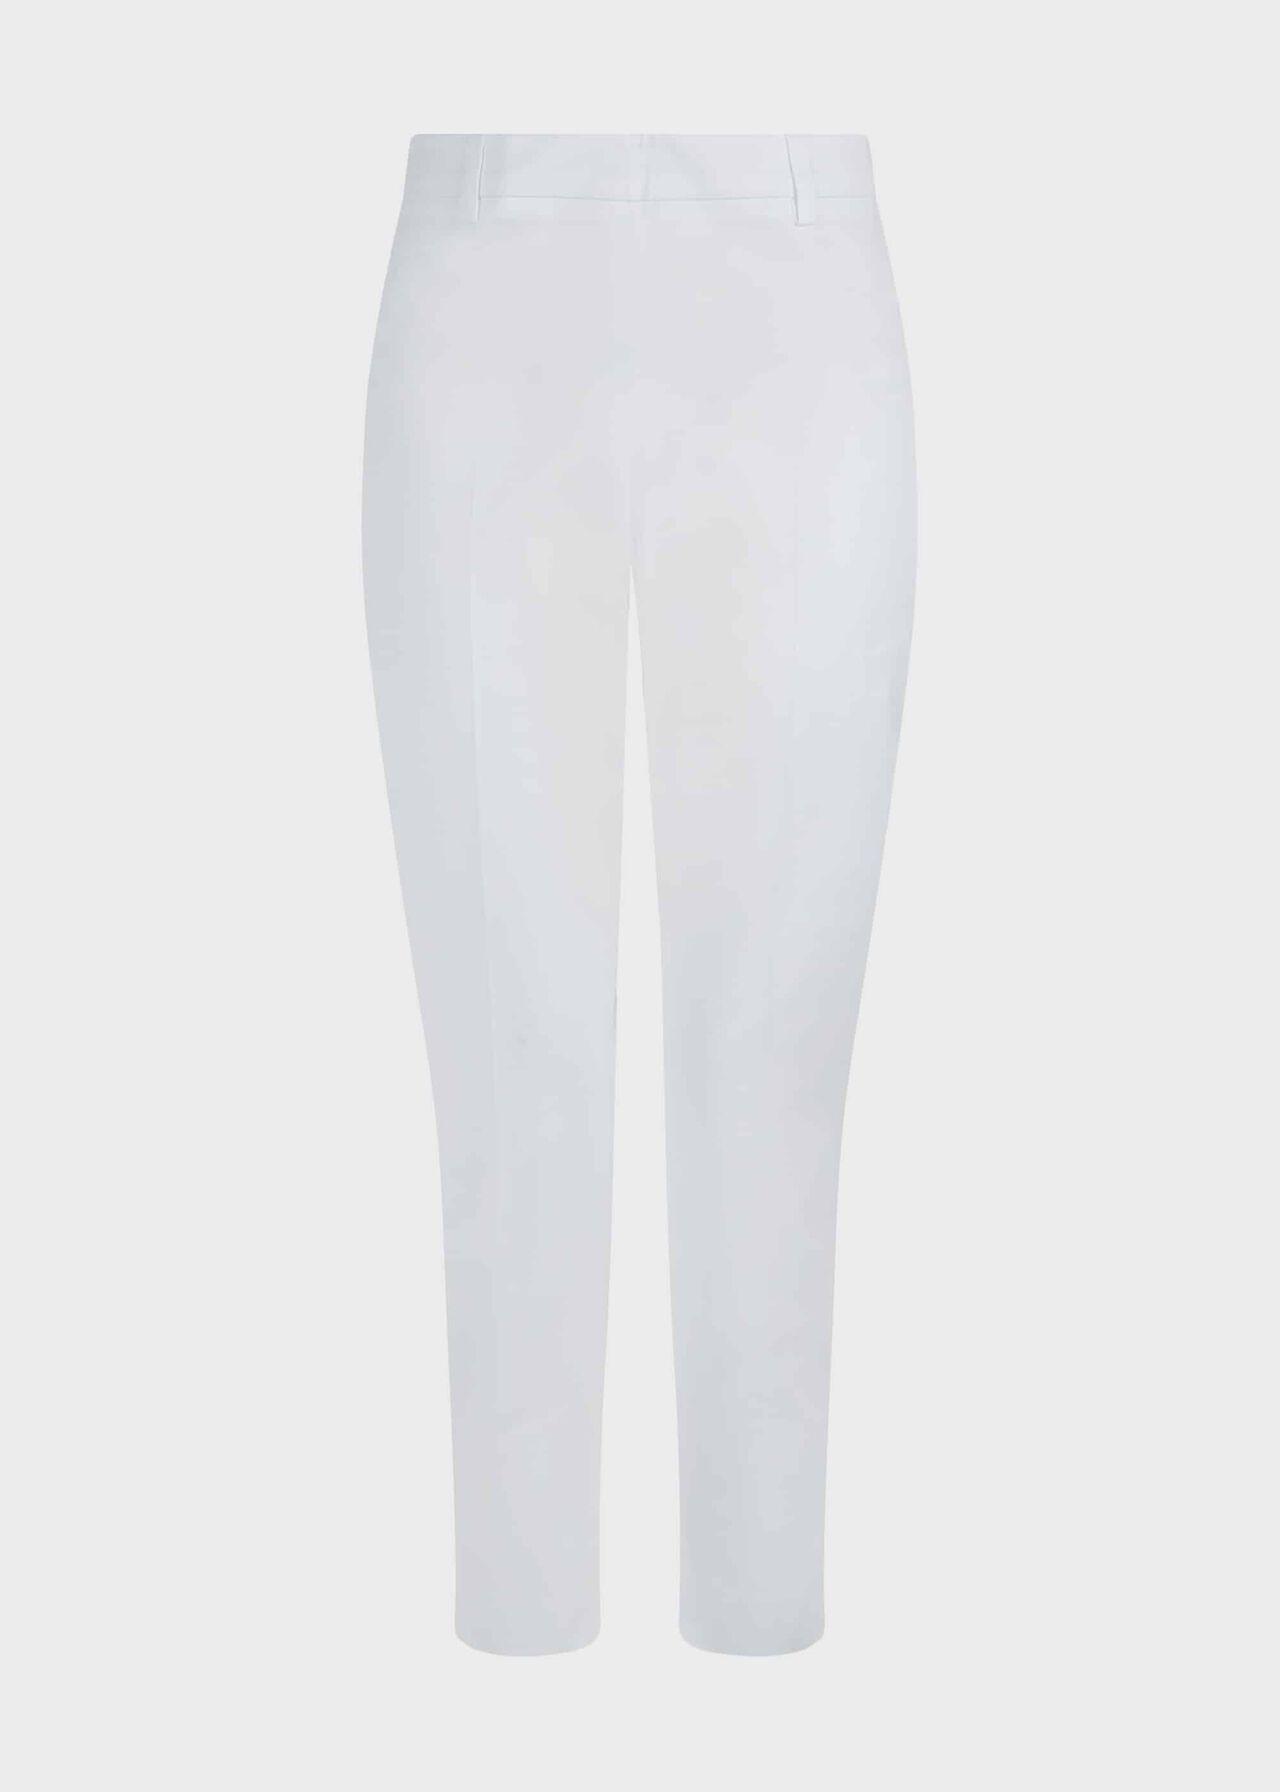 Mallory Cotton Blend Capri Trousers, White, hi-res